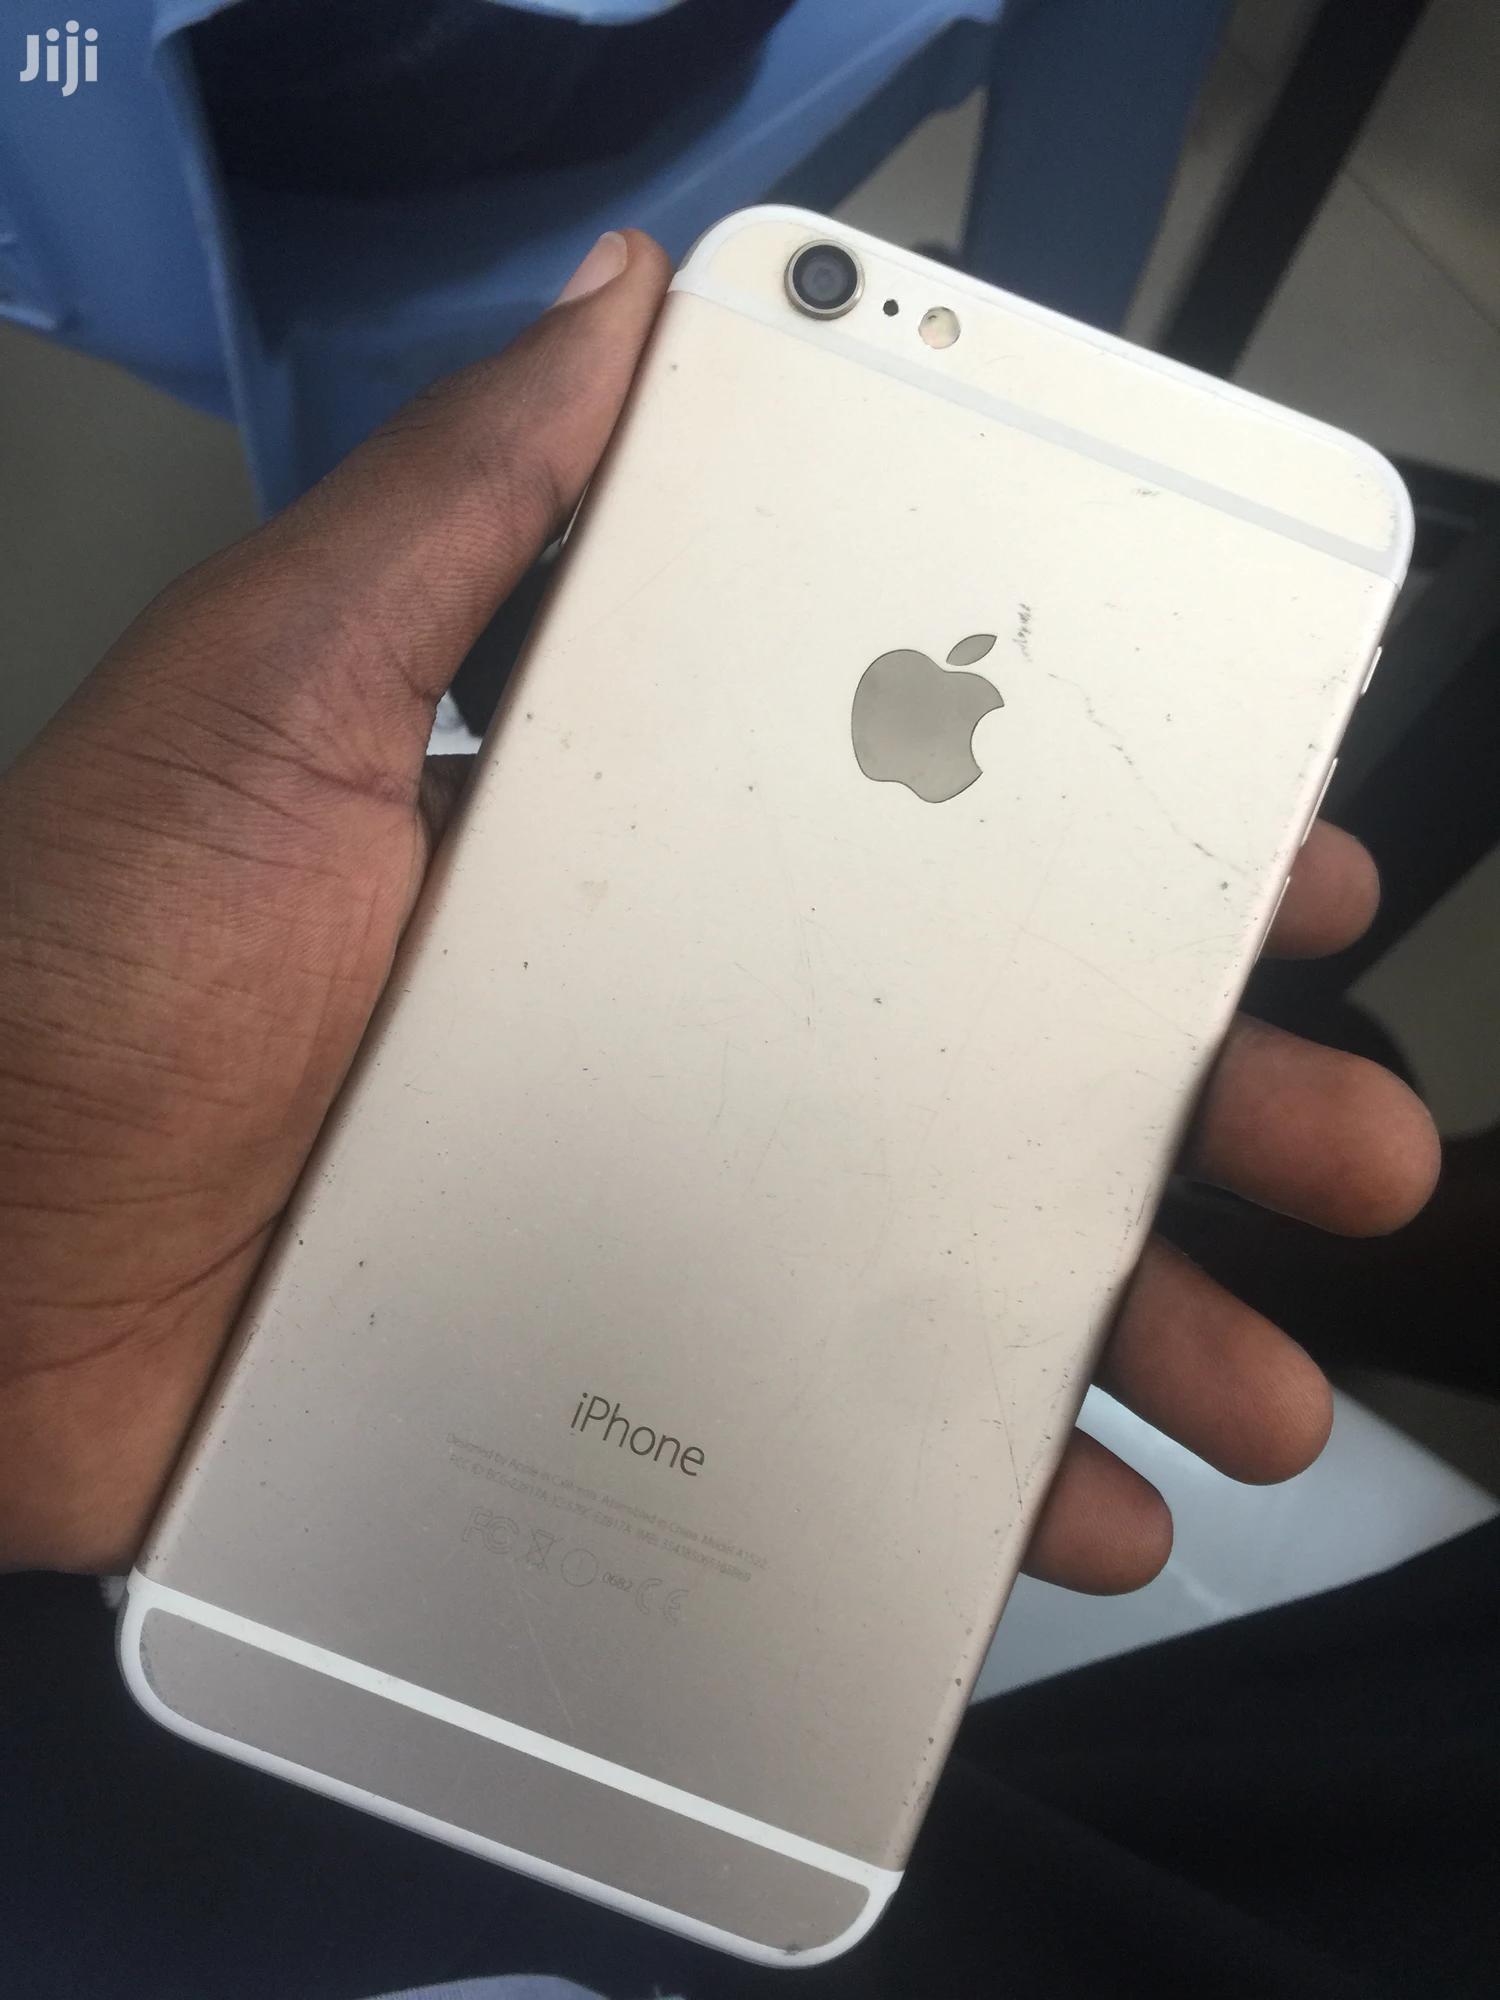 Apple iPhone 6 Plus 64 GB Silver   Mobile Phones for sale in Ilala, Dar es Salaam, Tanzania